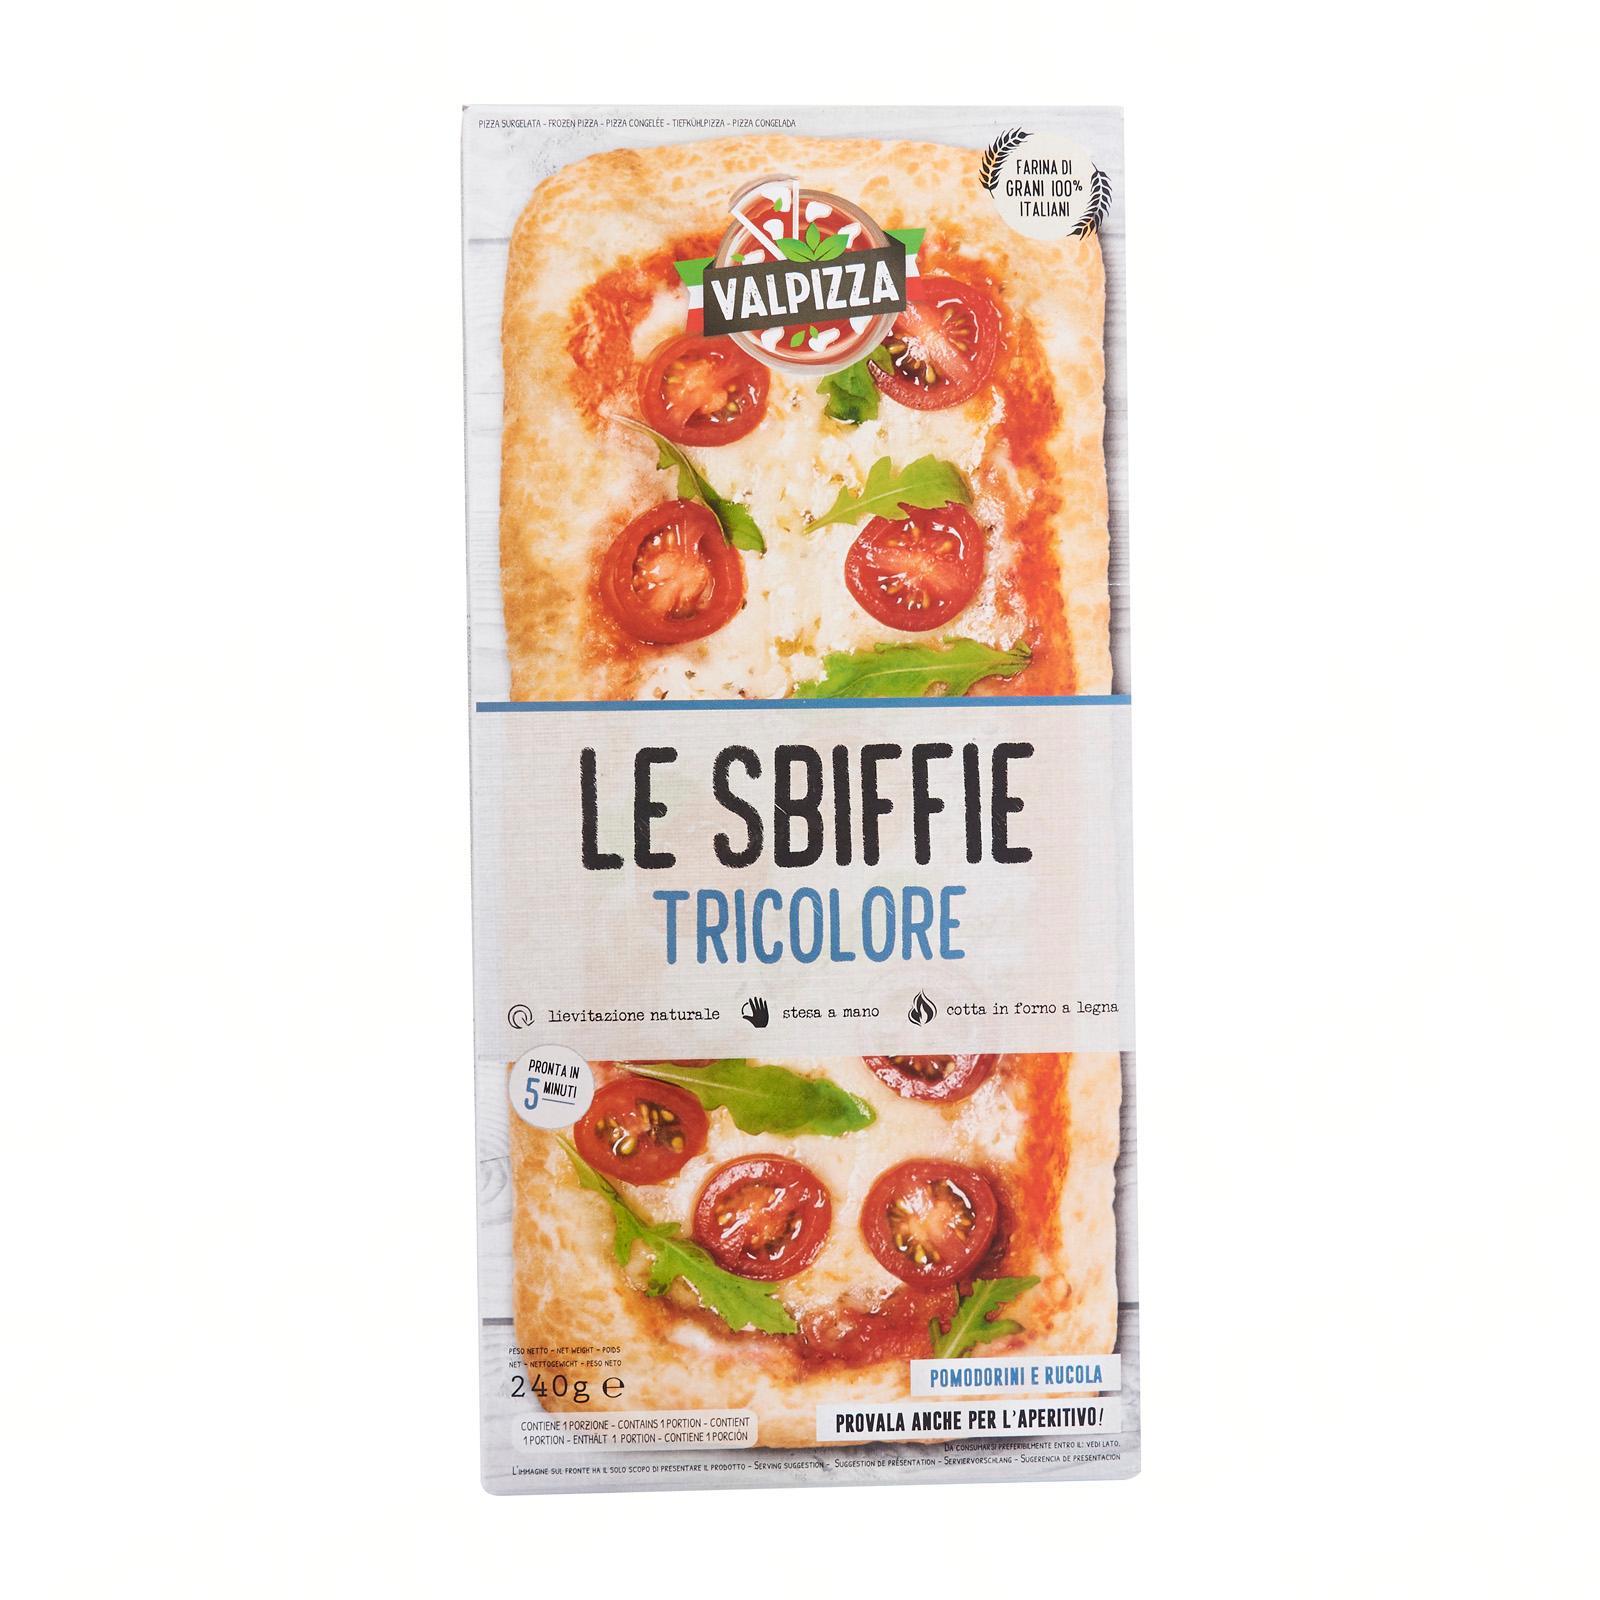 HeimatSterne Sbiffie-Valpizza Tricolore Cherry Tomatoes and Arugula Pizza - Frozen